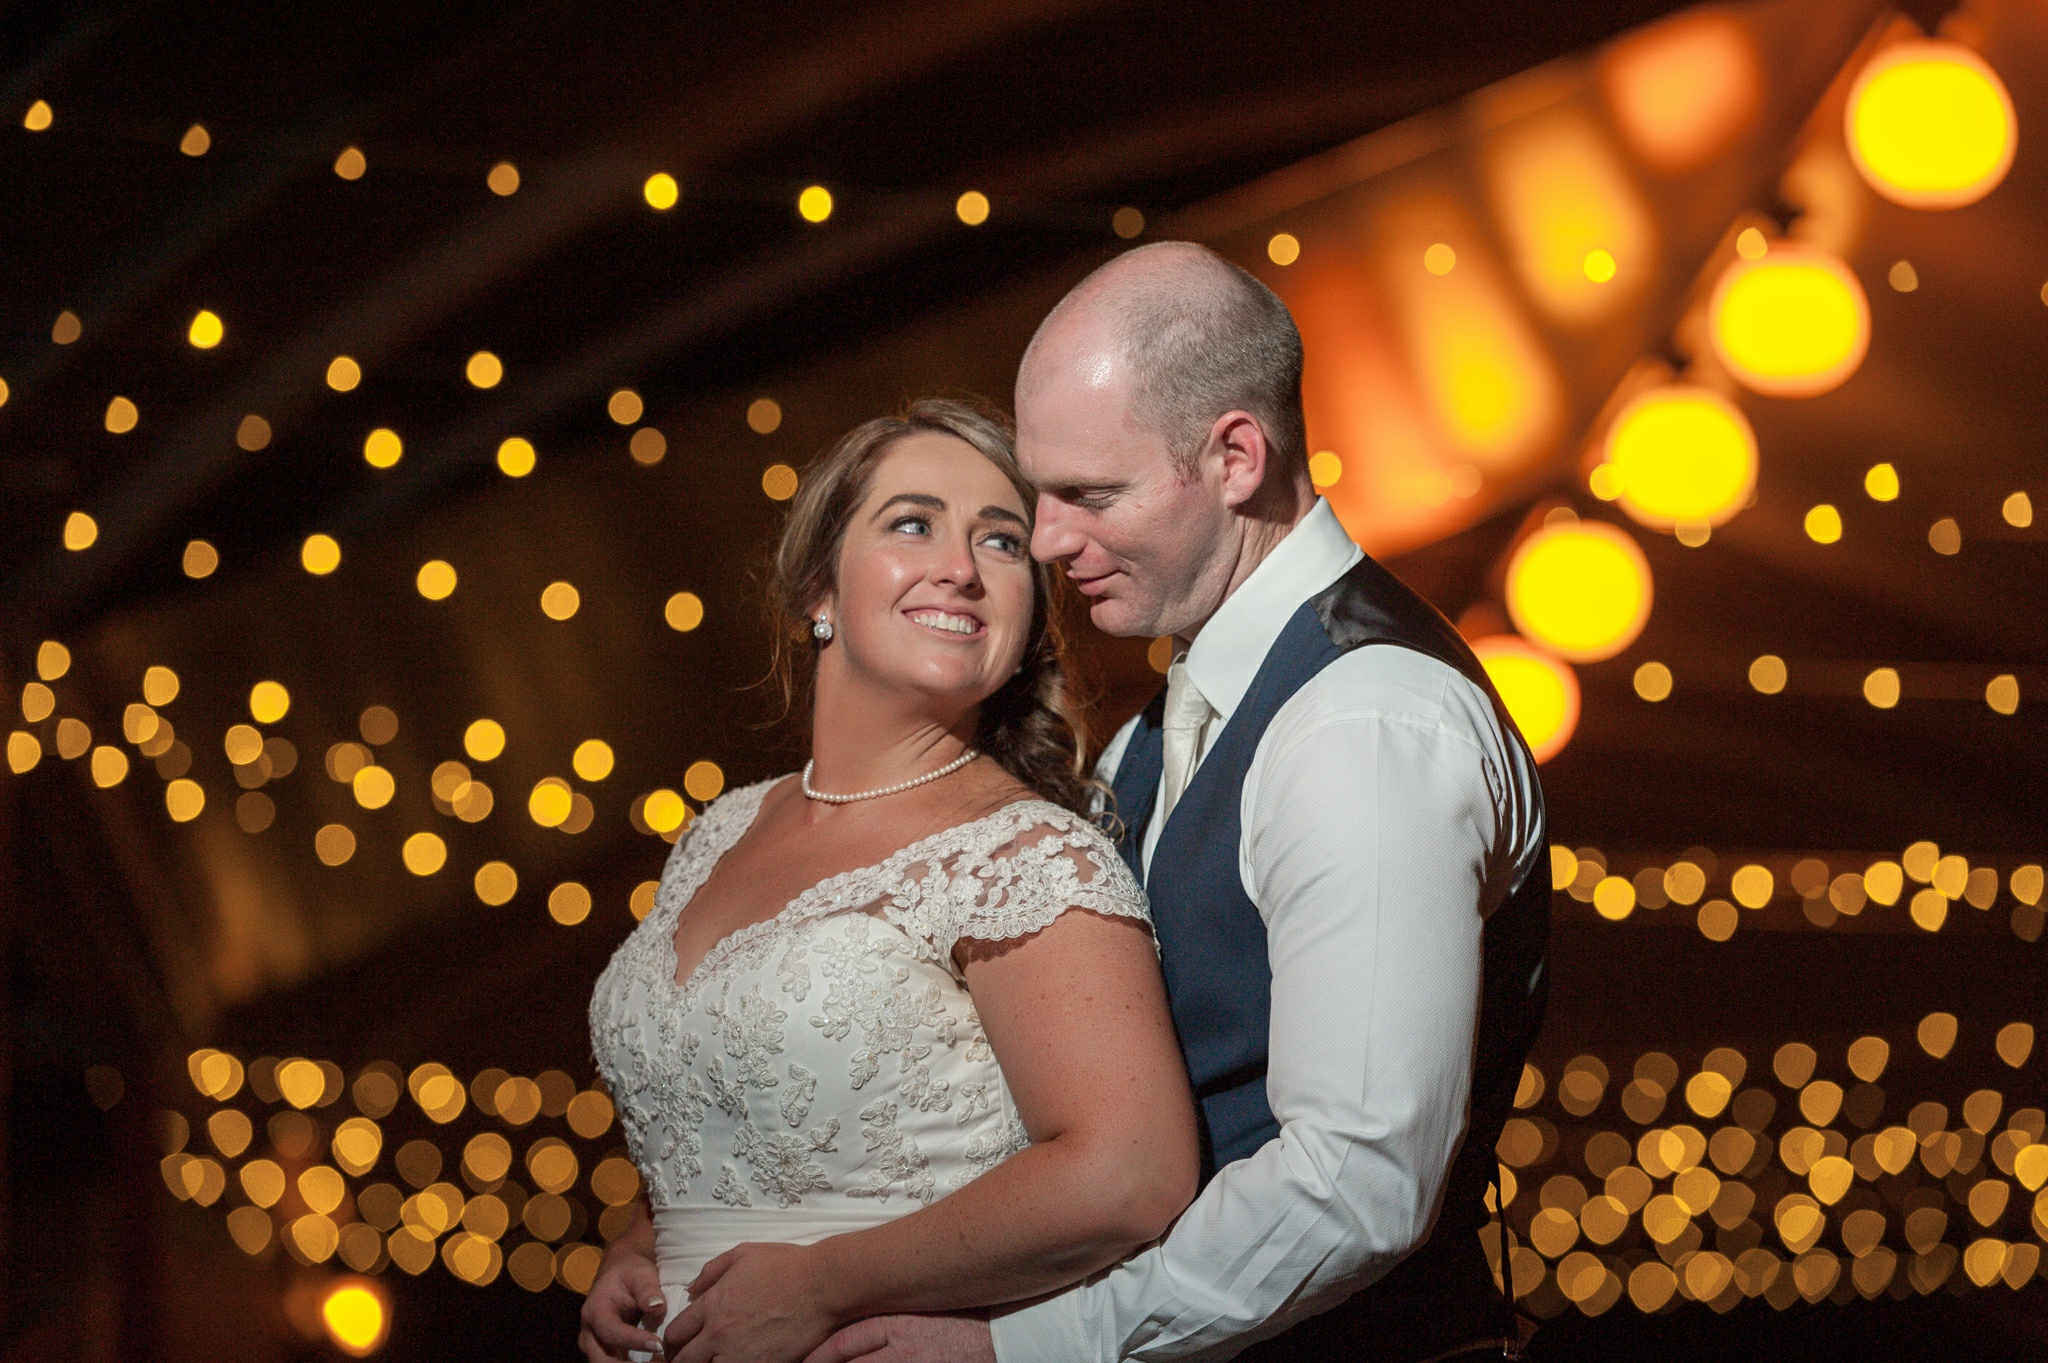 wedding_Andrew-&-Kim_0046.jpg